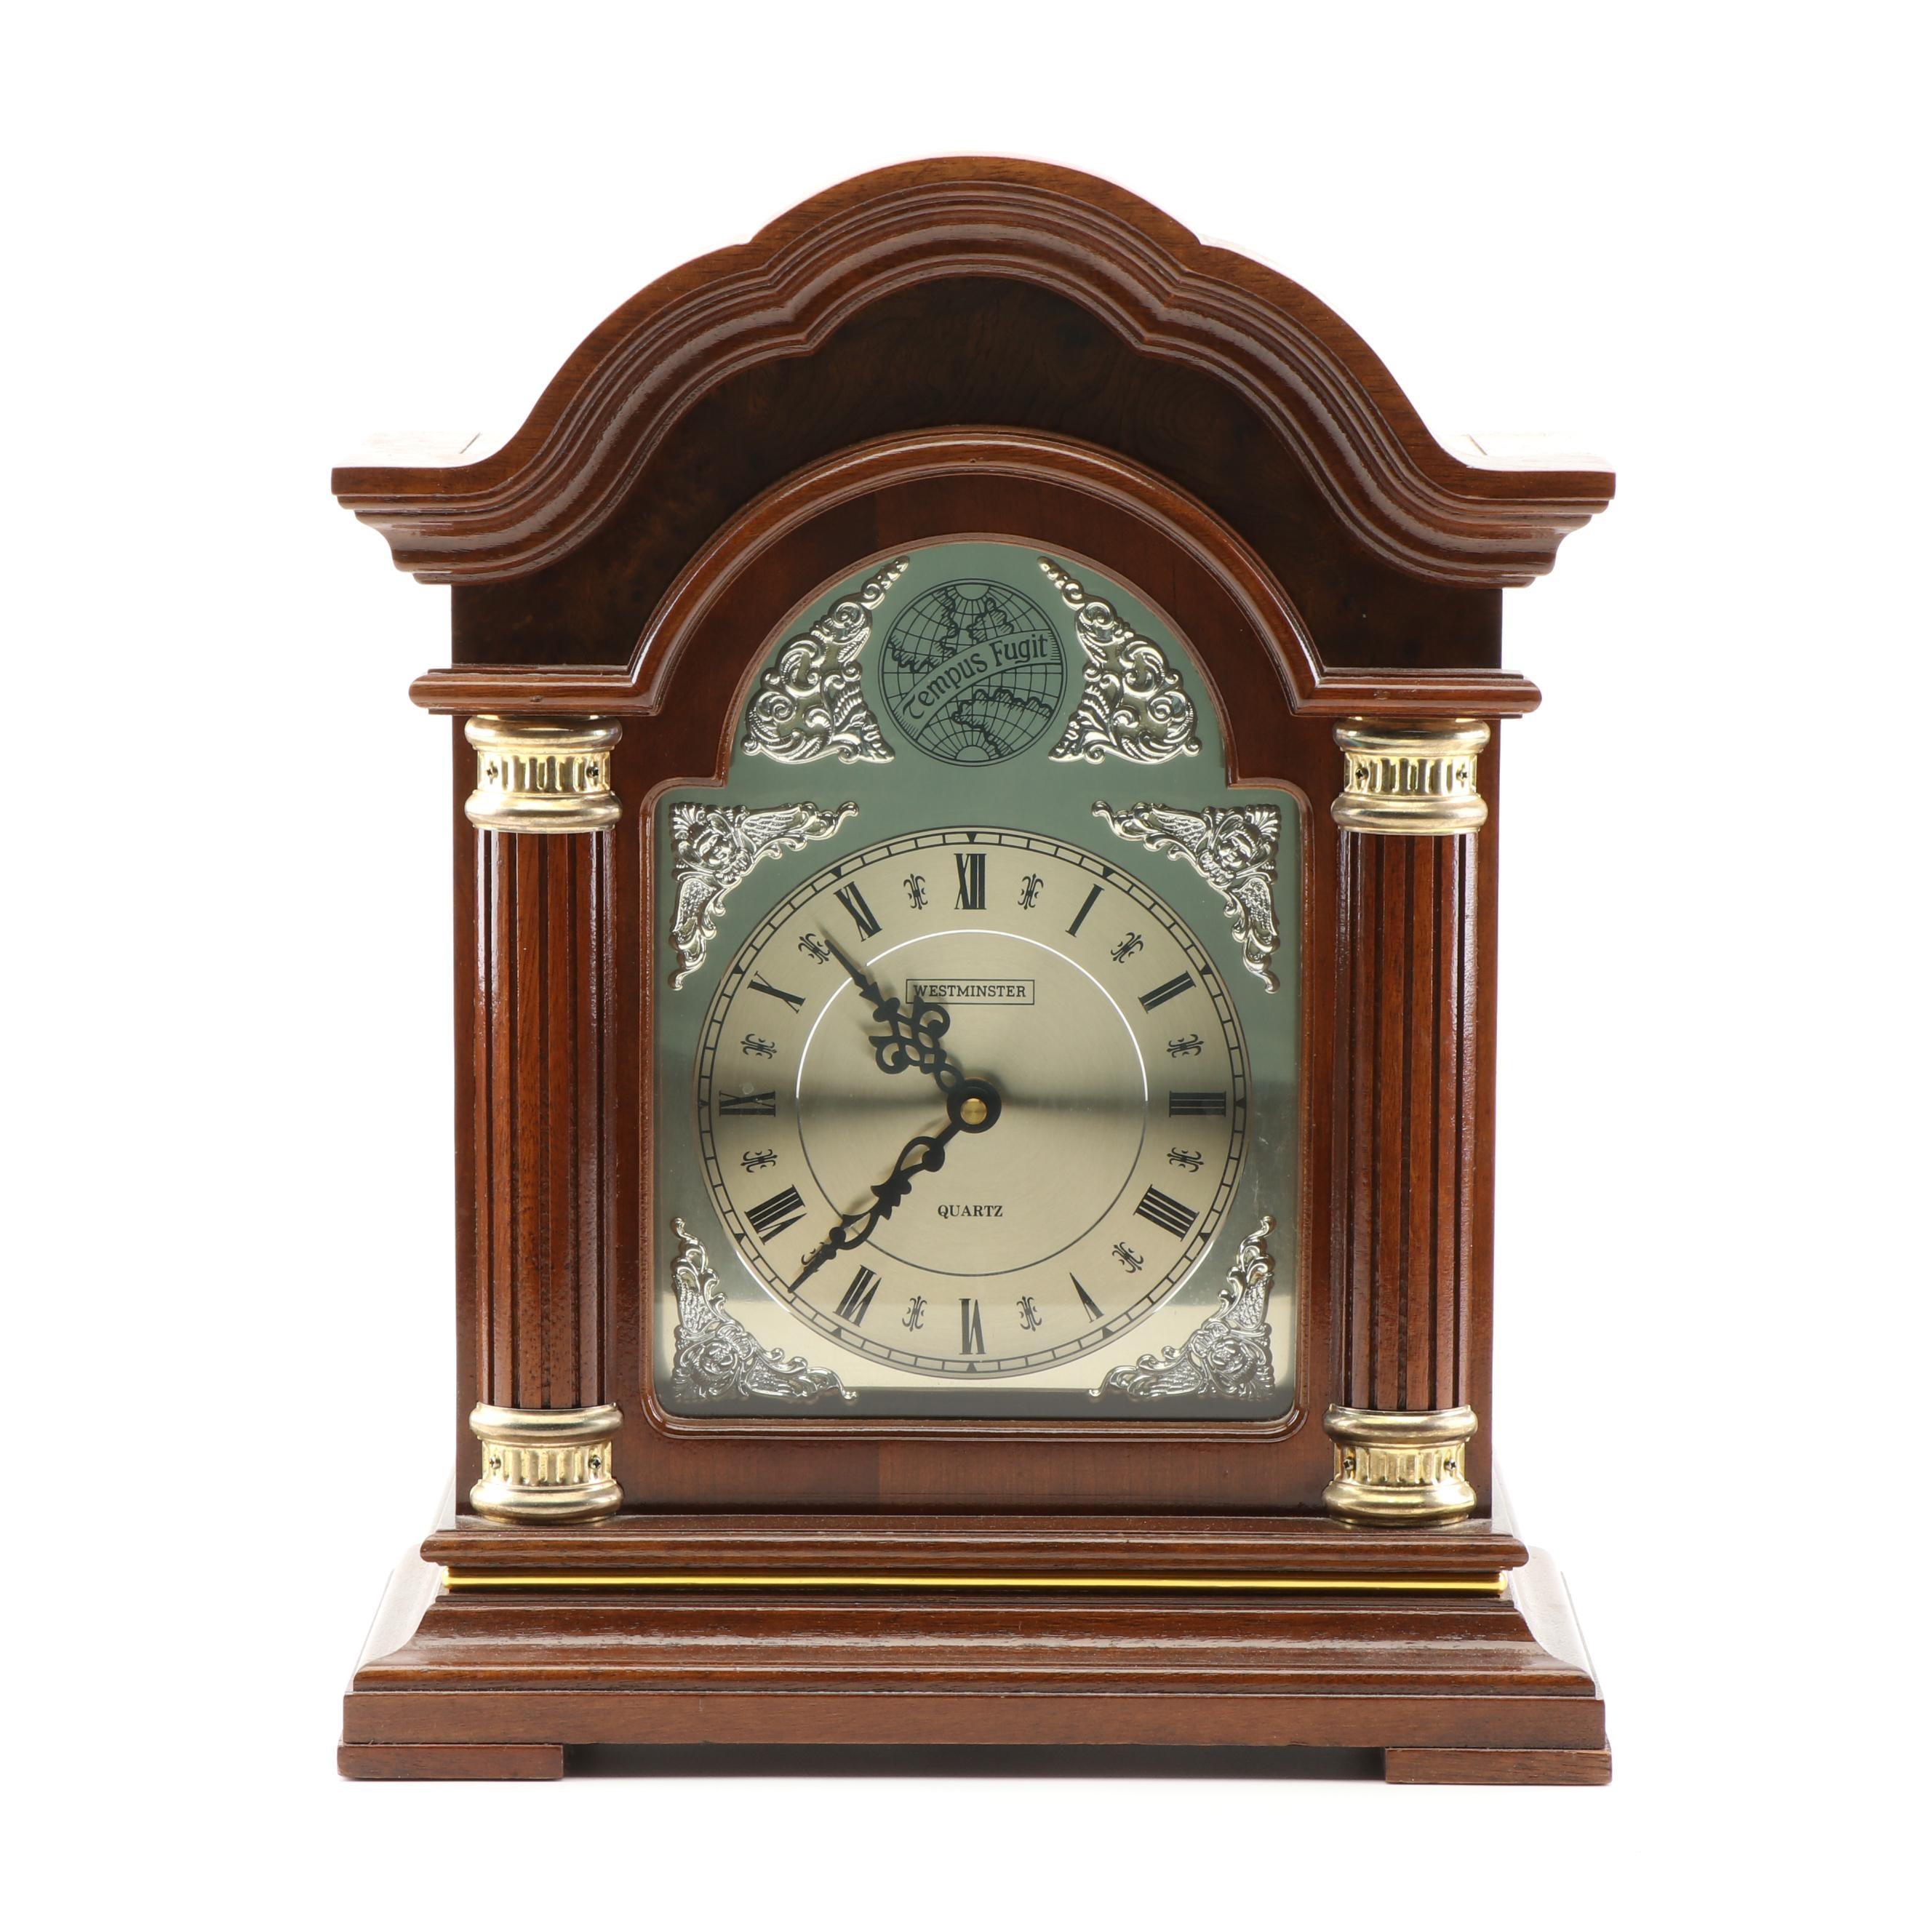 Westminster Quartz Mantle Chime Clock